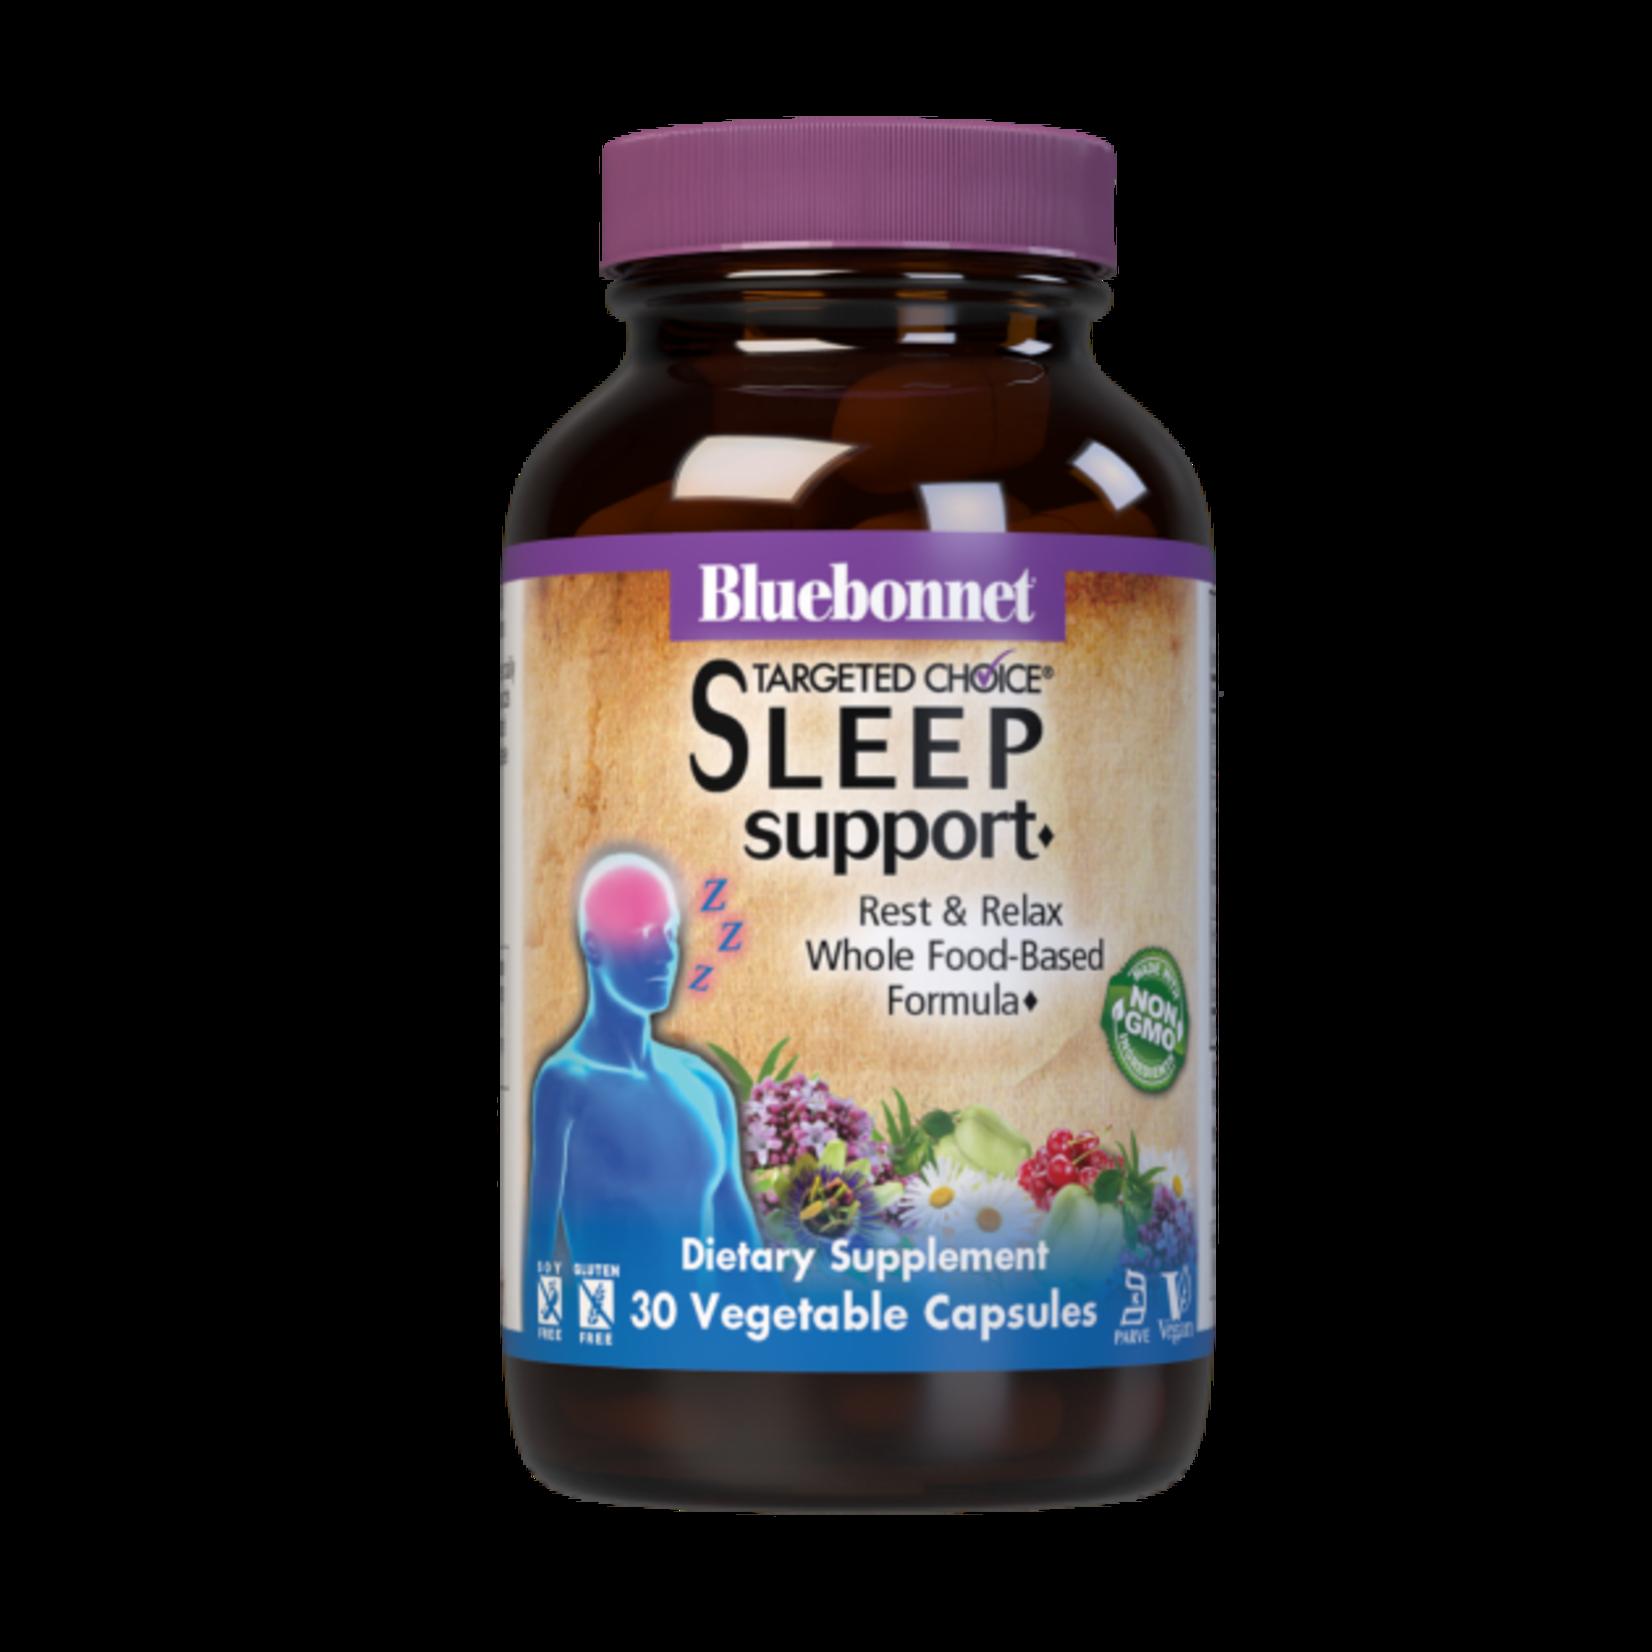 BlueBonnet Bluebonnet Sleep Support 30 Veg Capsules